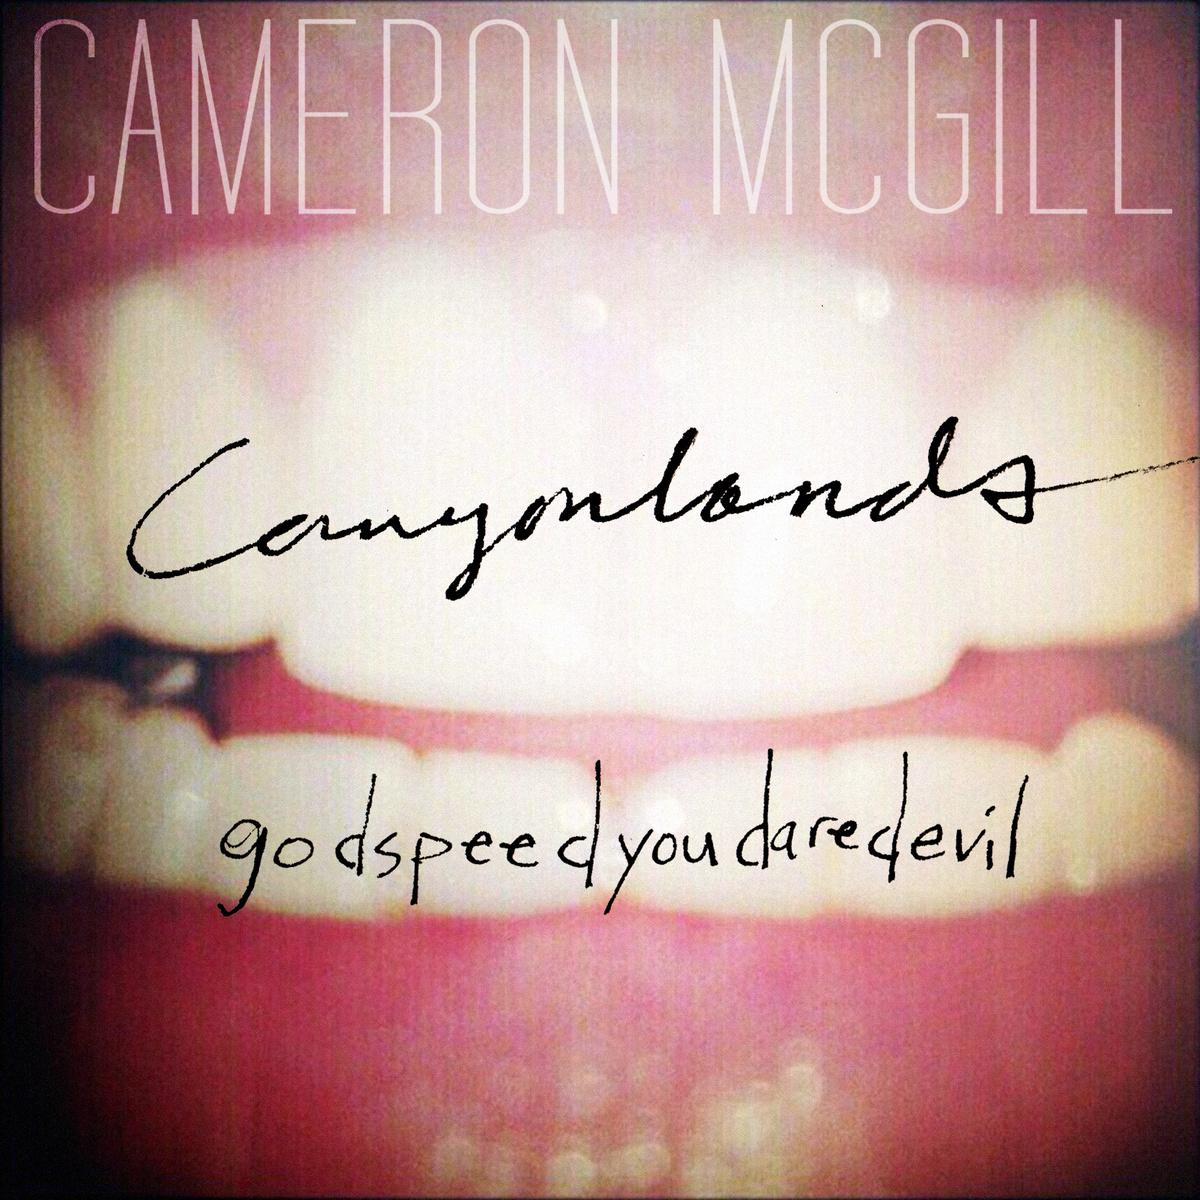 "Cameron McGill ""Canyonlands b/w godspeedyoudaredevil"""